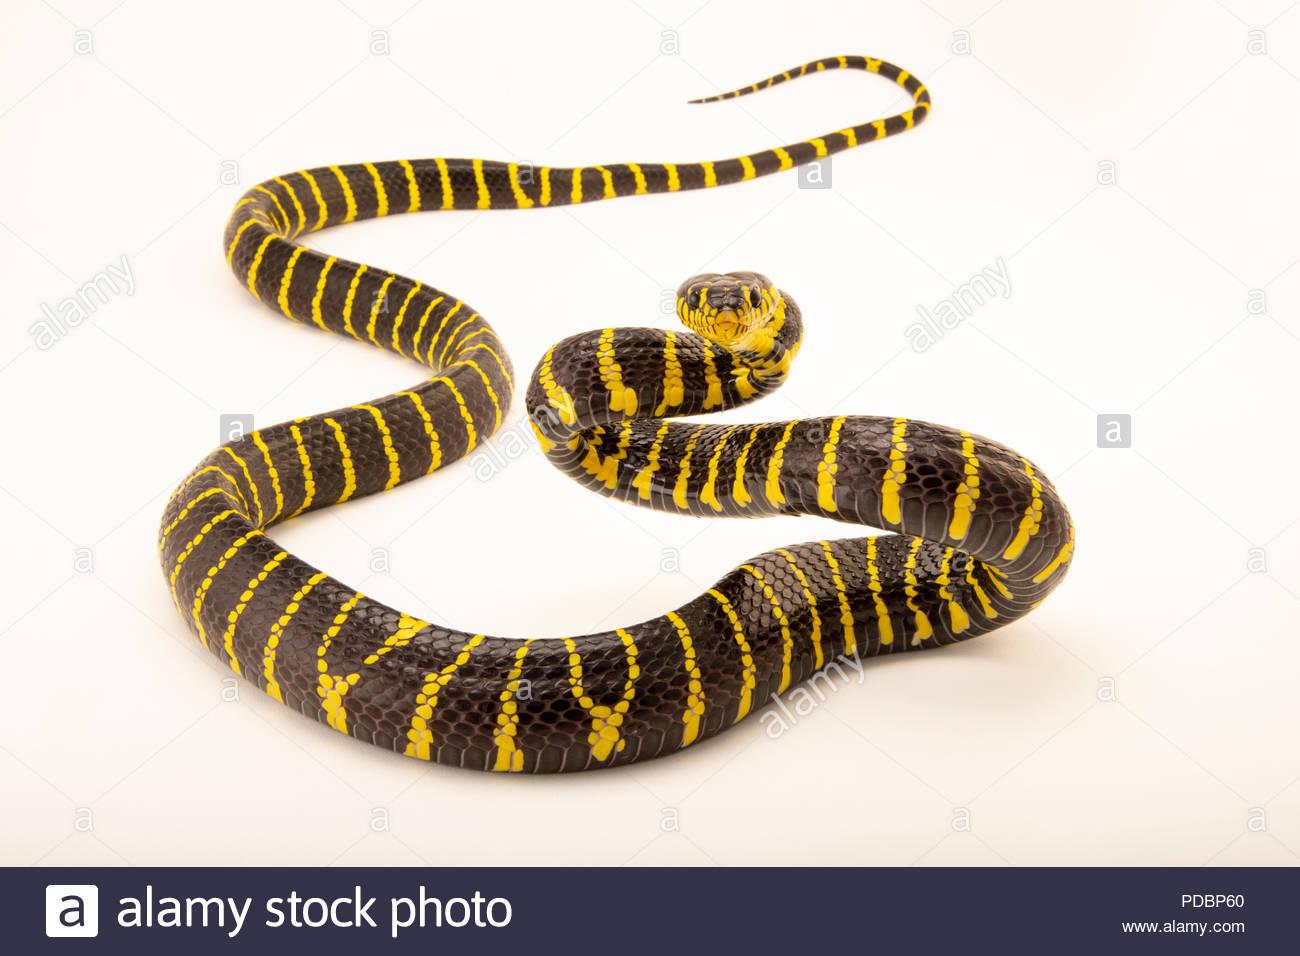 Philippine mangrove snake, Boiga dendrophila multicincta, at the Avilon Zoo. - Stock Image